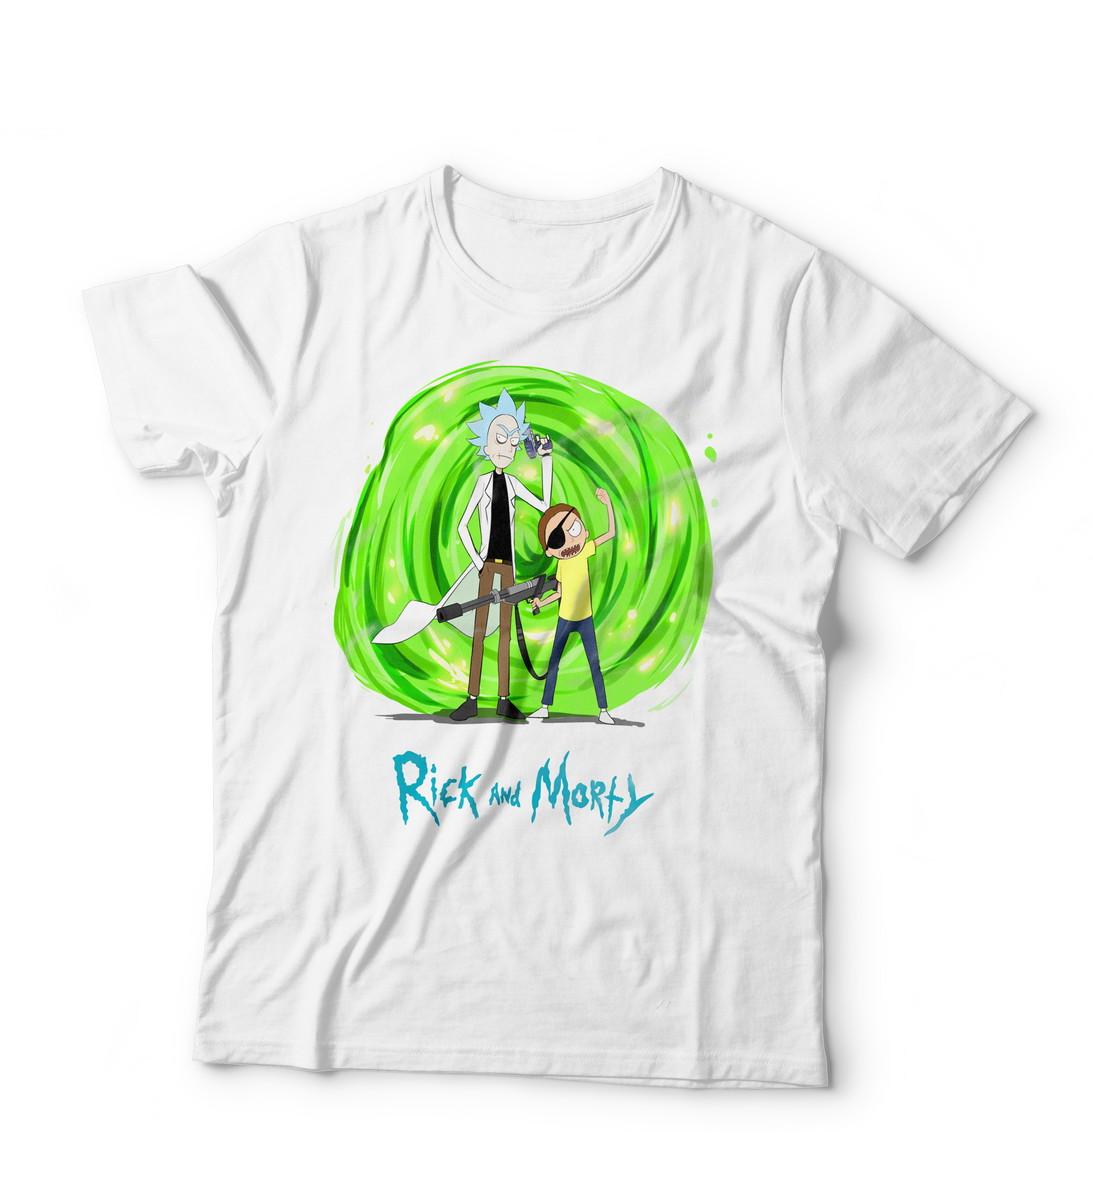 37aefb947 Camiseta Rick and Morty III no Elo7